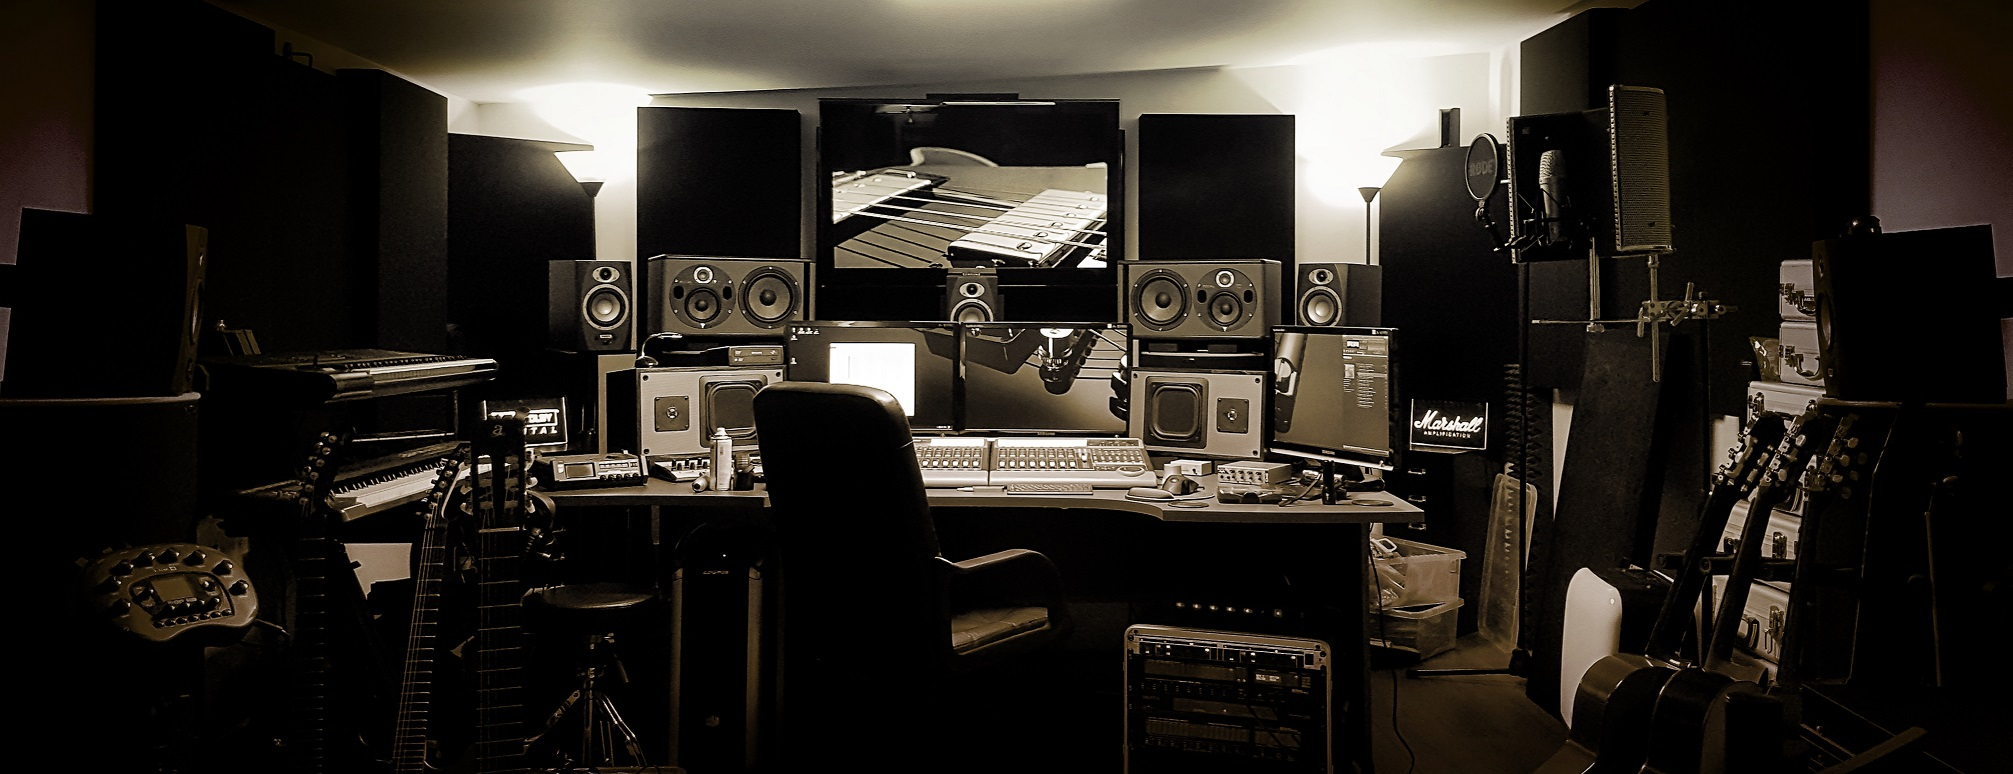 Recording studio equipment panoramic